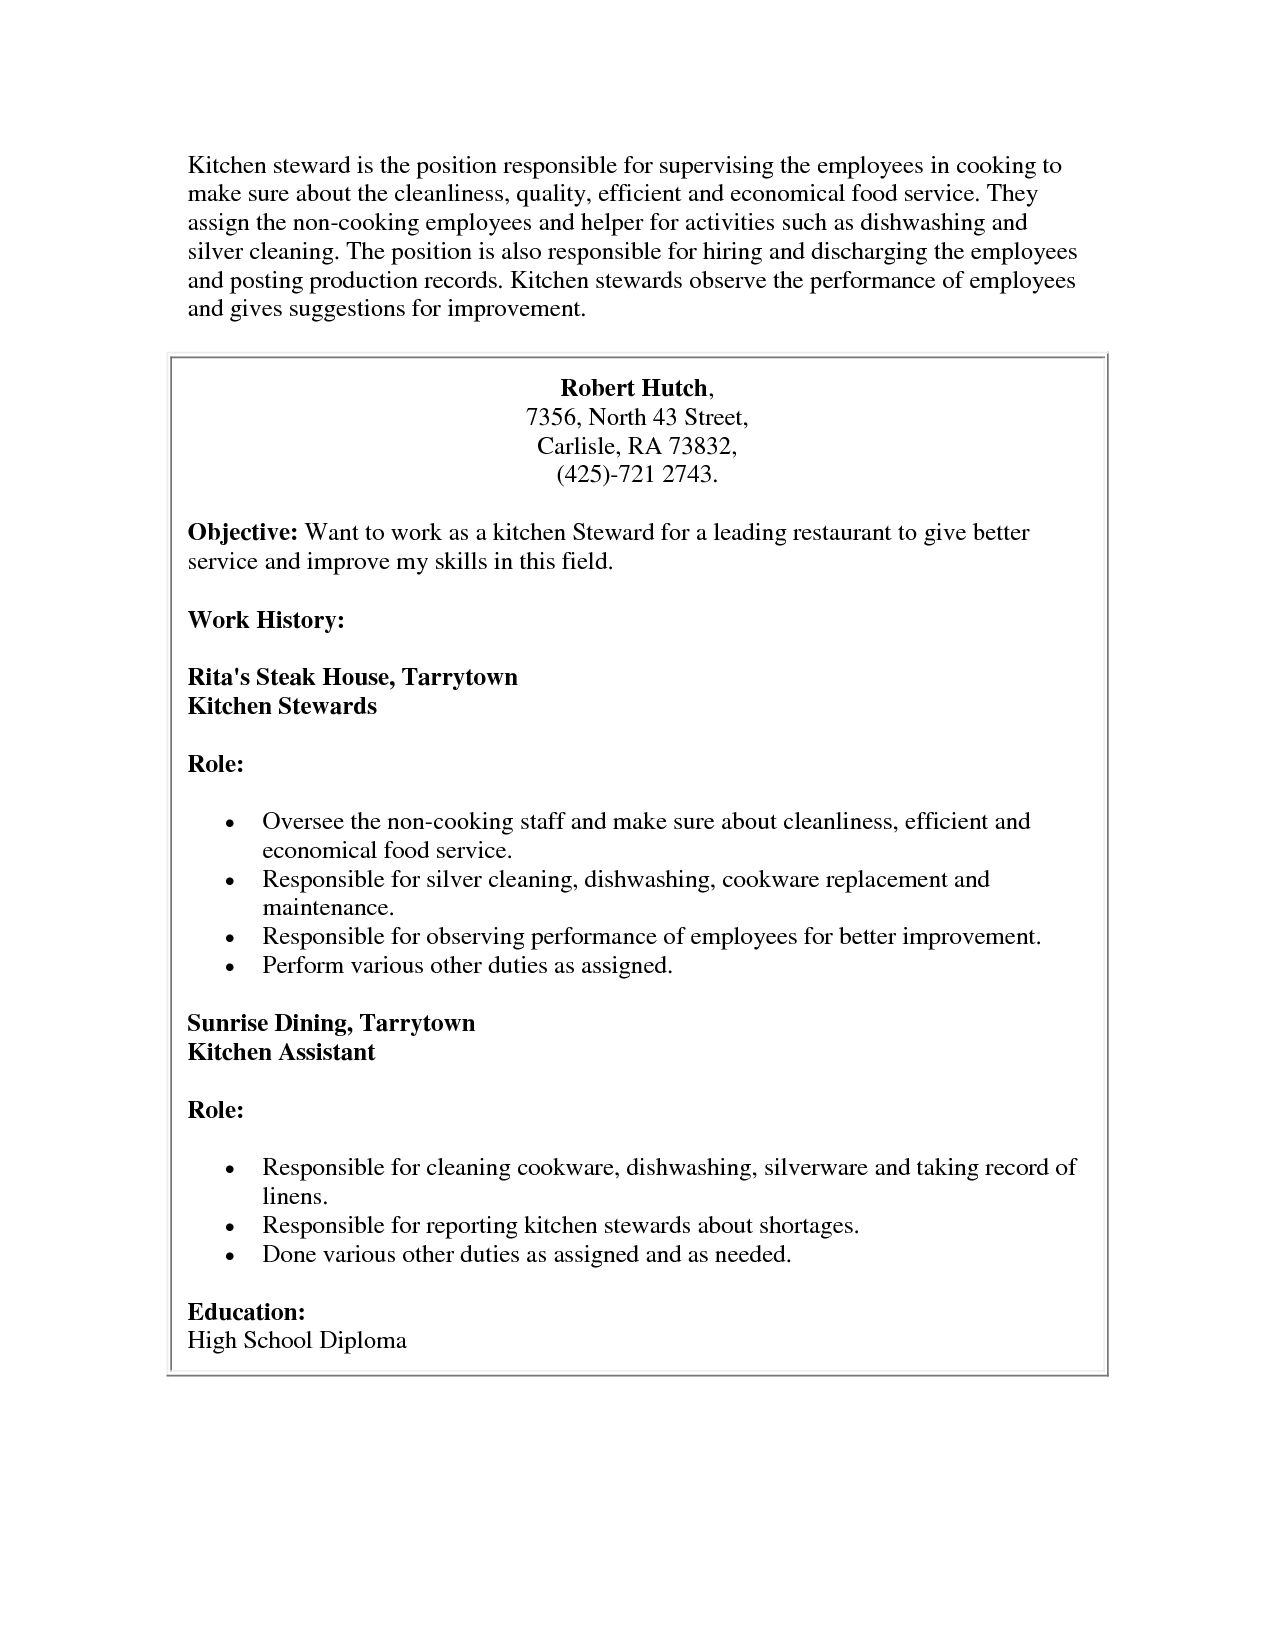 Resume Examples Kitchen Helper | Pinterest | Resume examples ...